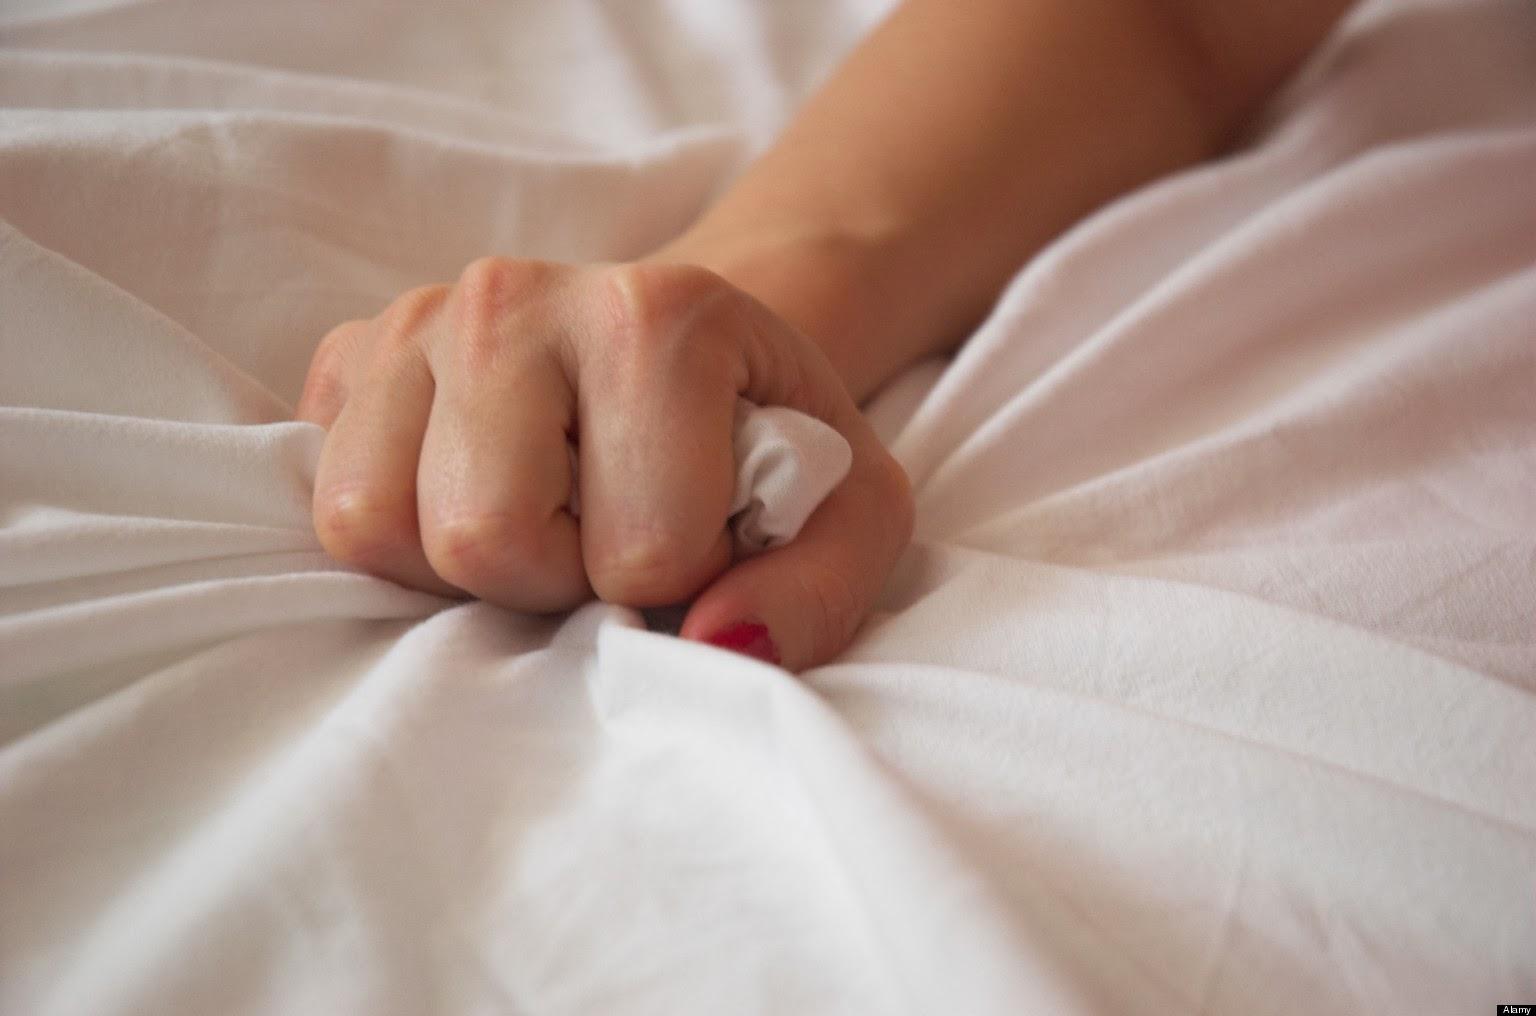 Multiple hands in vagina video